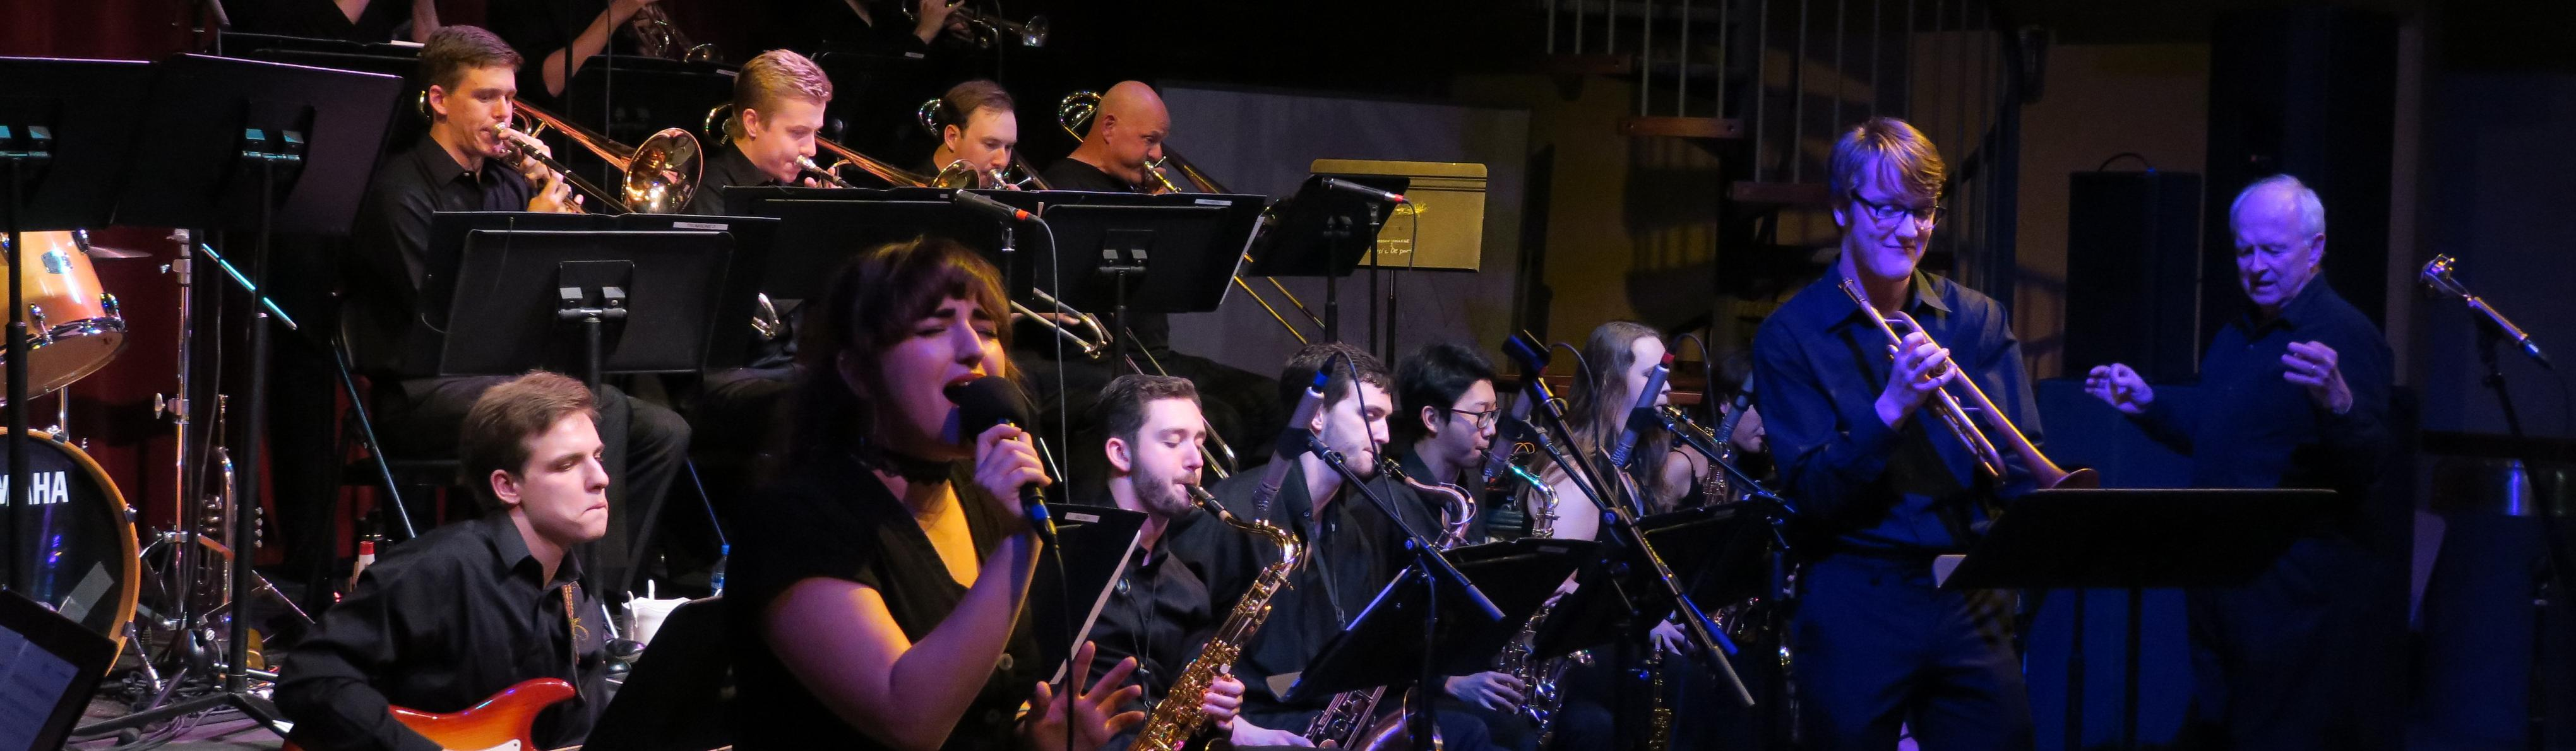 Image Courtesy: Davidson College Jazz Ensemble